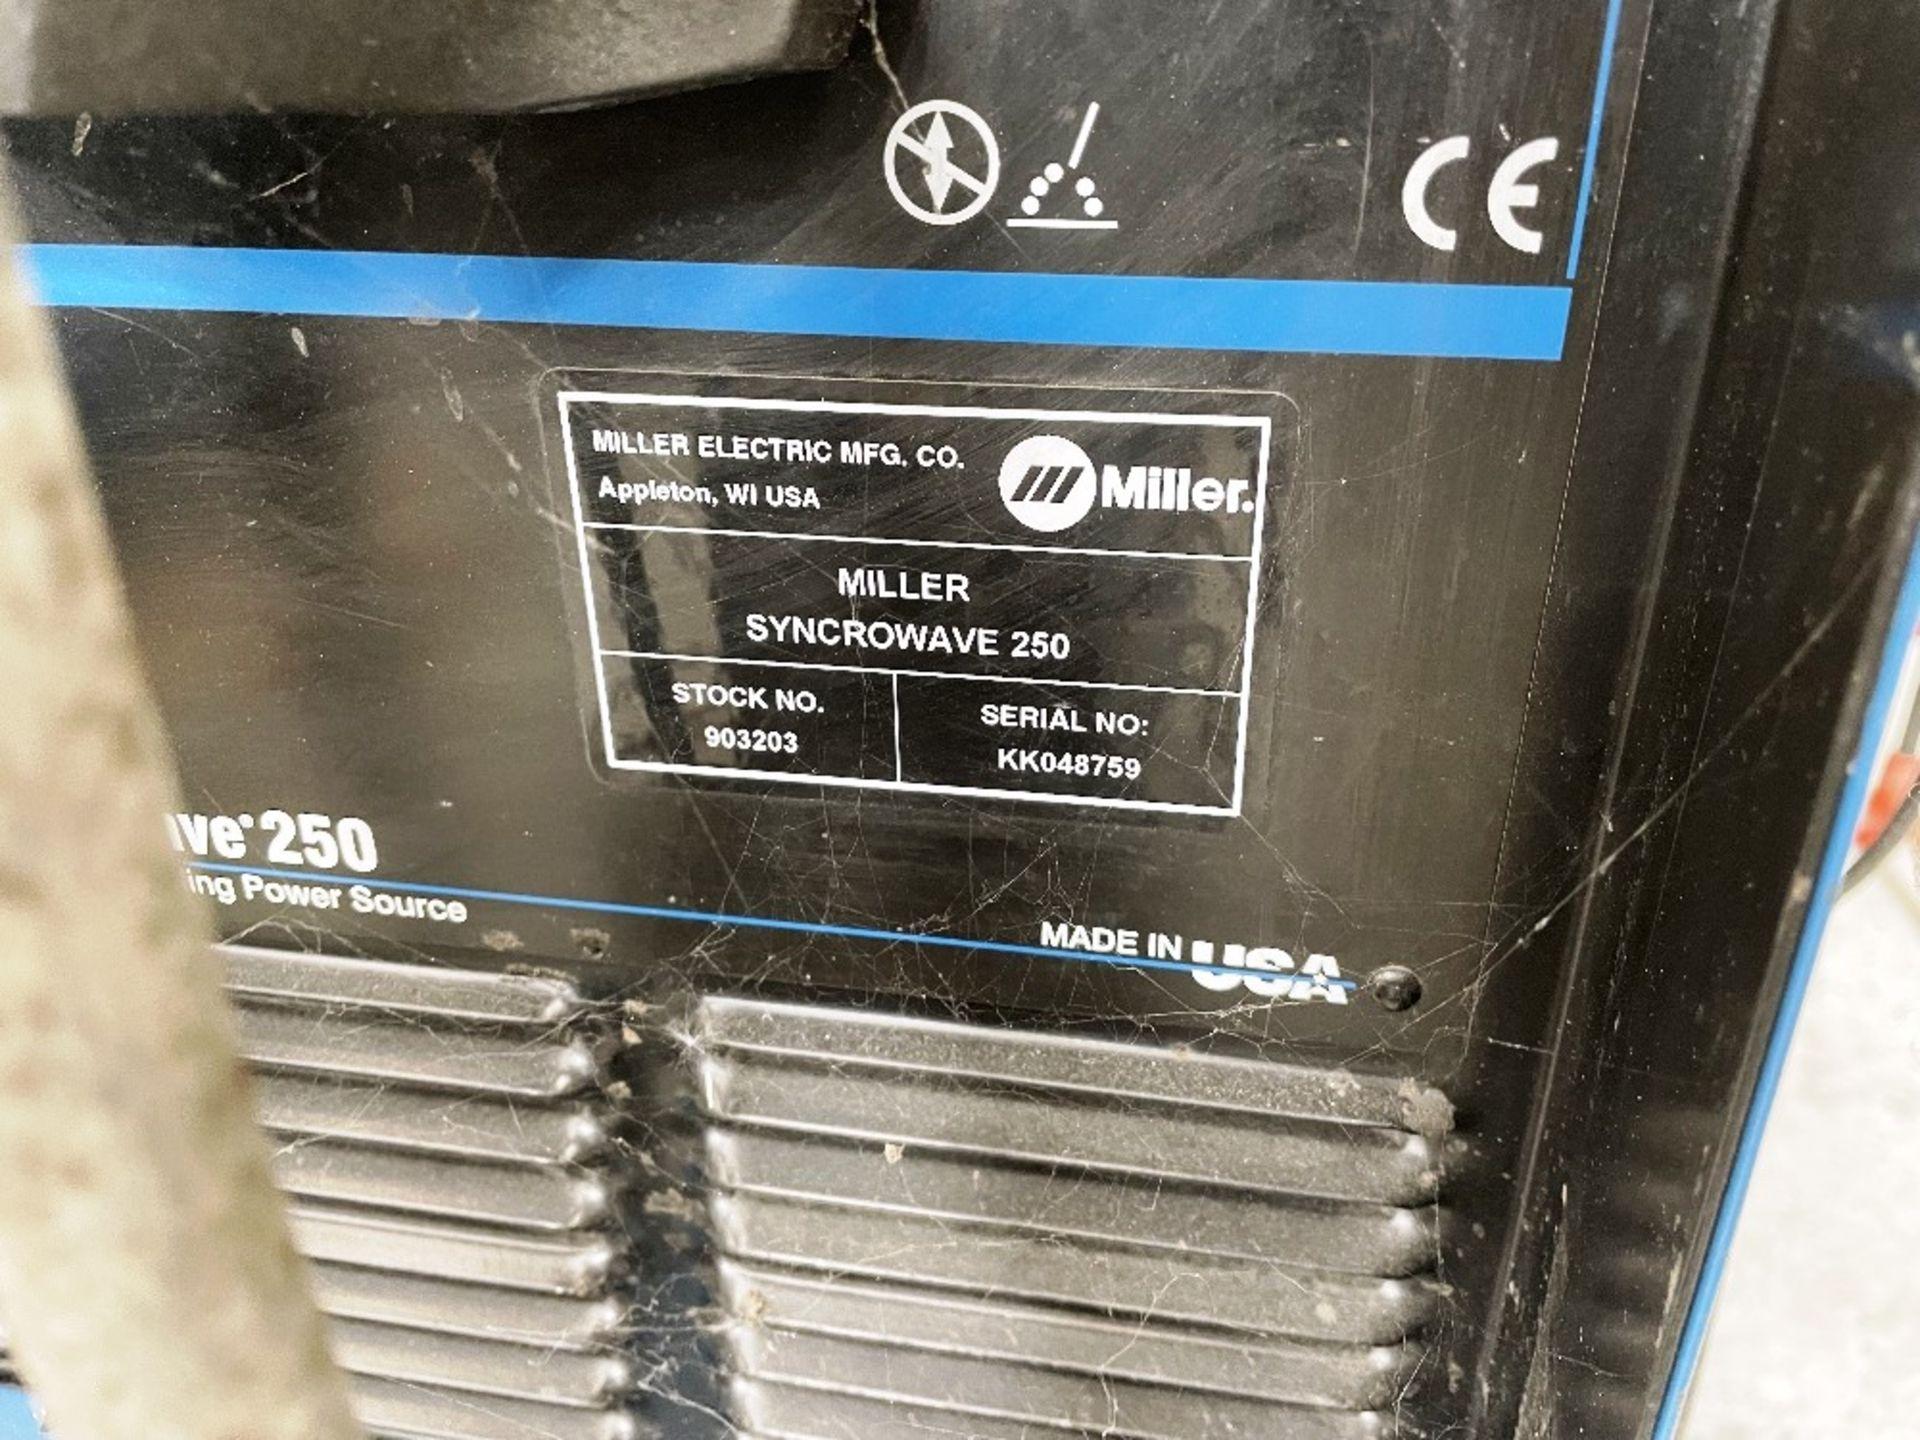 Miller Syncrowave 250 Tig Welder w/ TecArc XC1000 Water Cooler - Image 2 of 5